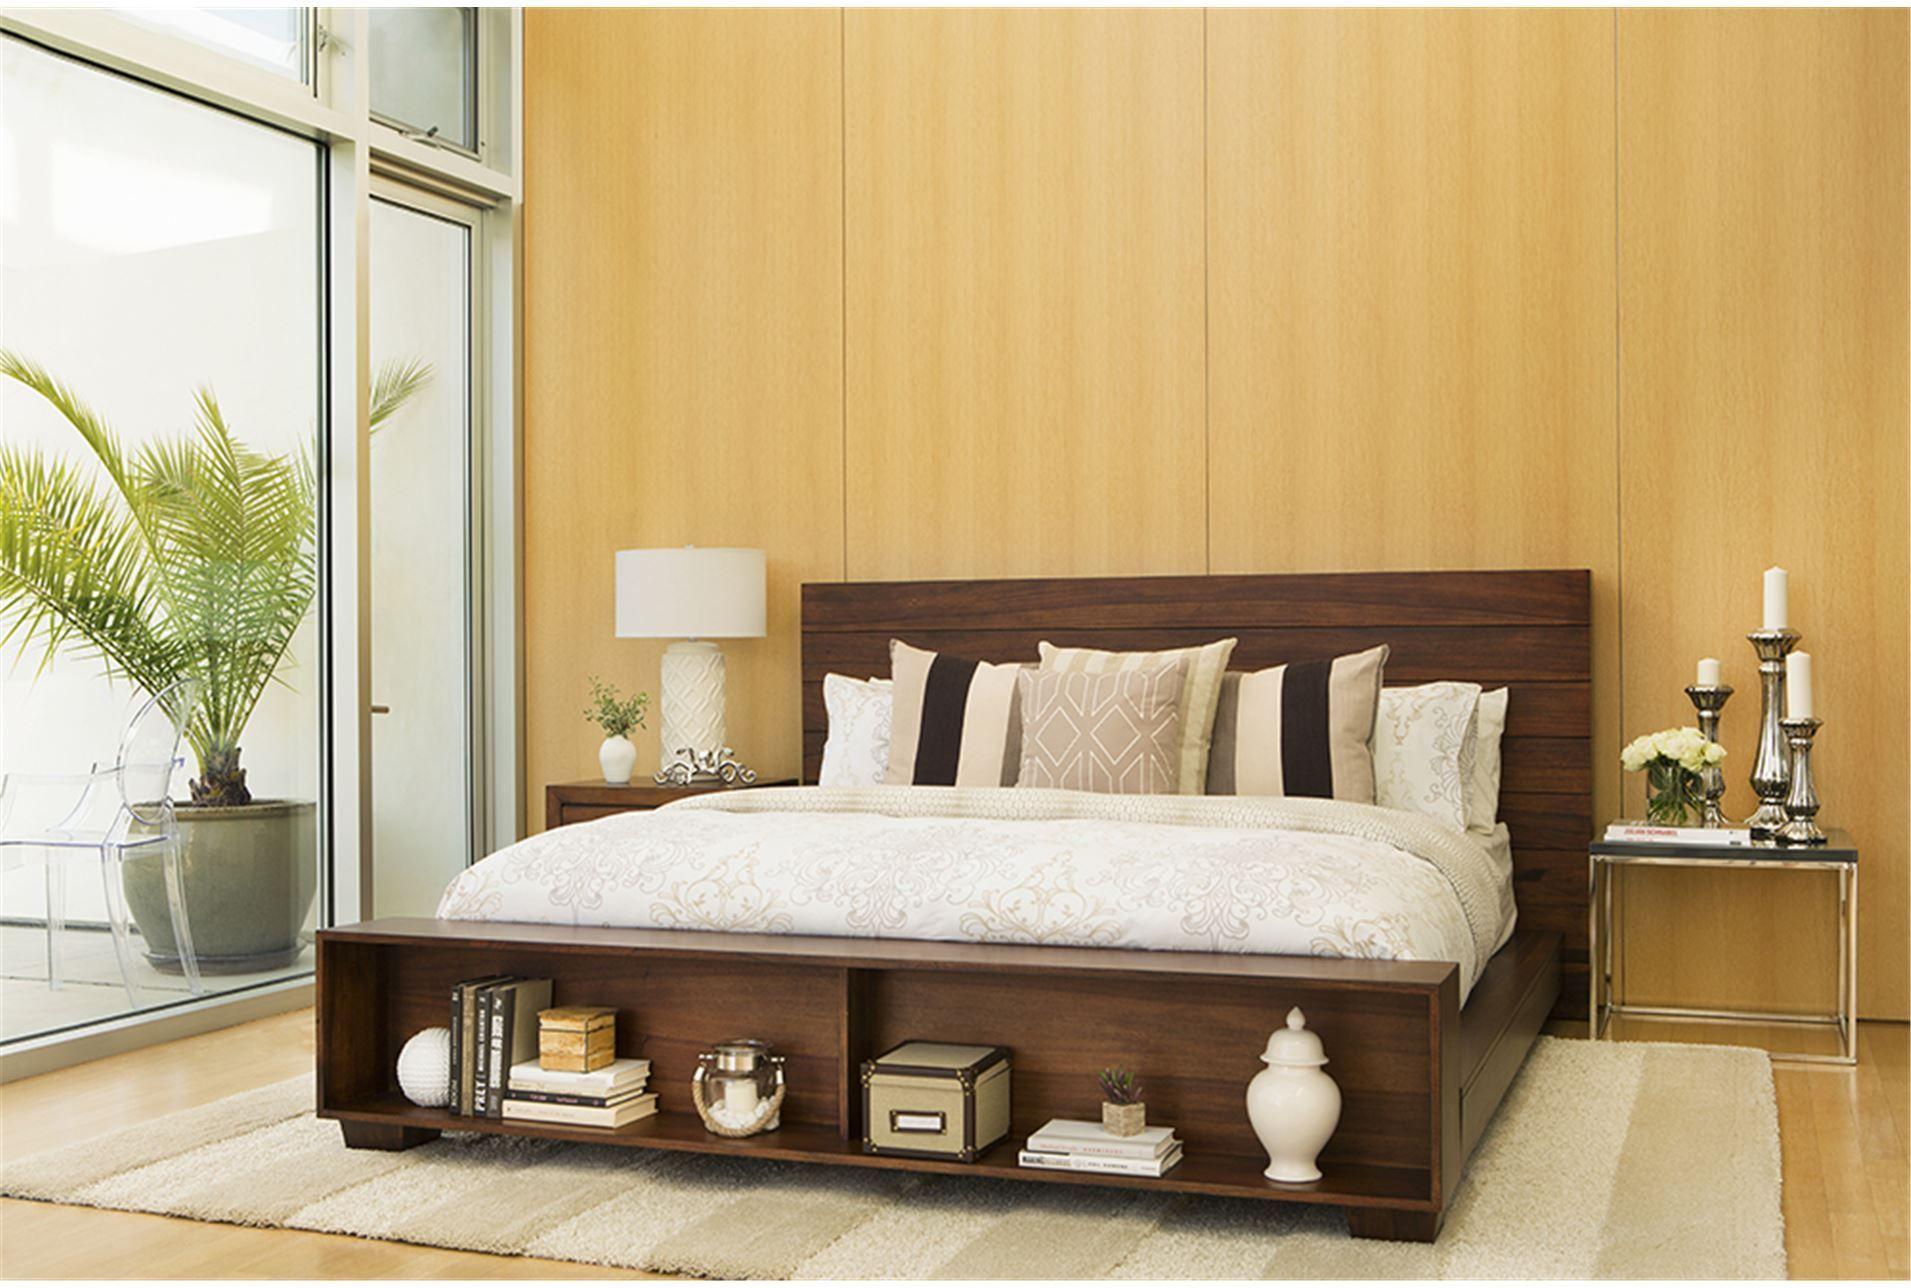 amazing asian platform bed. beautiful quinn california king platform bed signature with  Platform Bed California King Perfect Dona Faux Leather